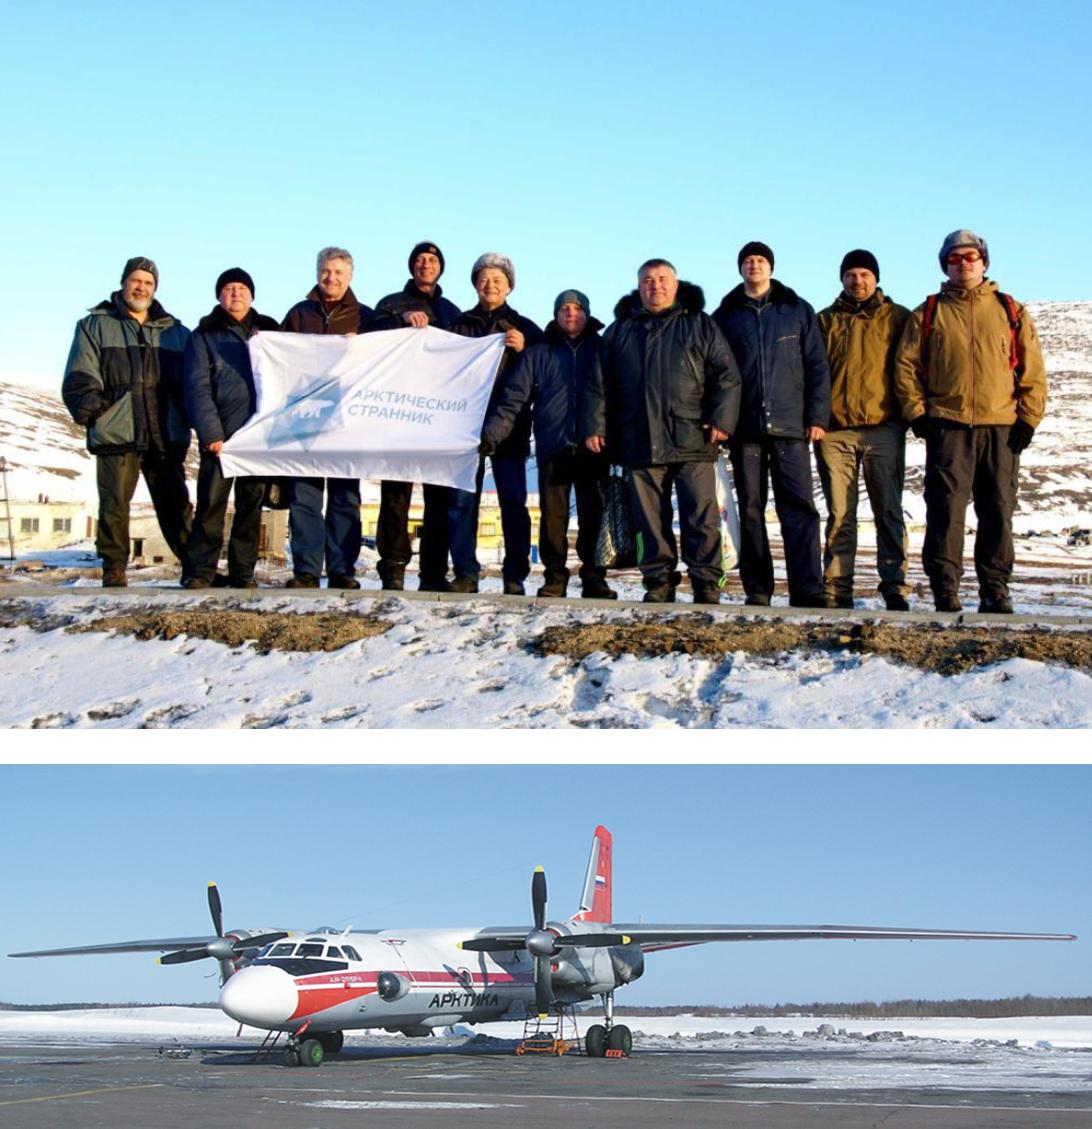 Two photos, top: a survey team standing on snow holding a Russian polar bear banner, bottom: a Russian survey aircraft on the tarmac.